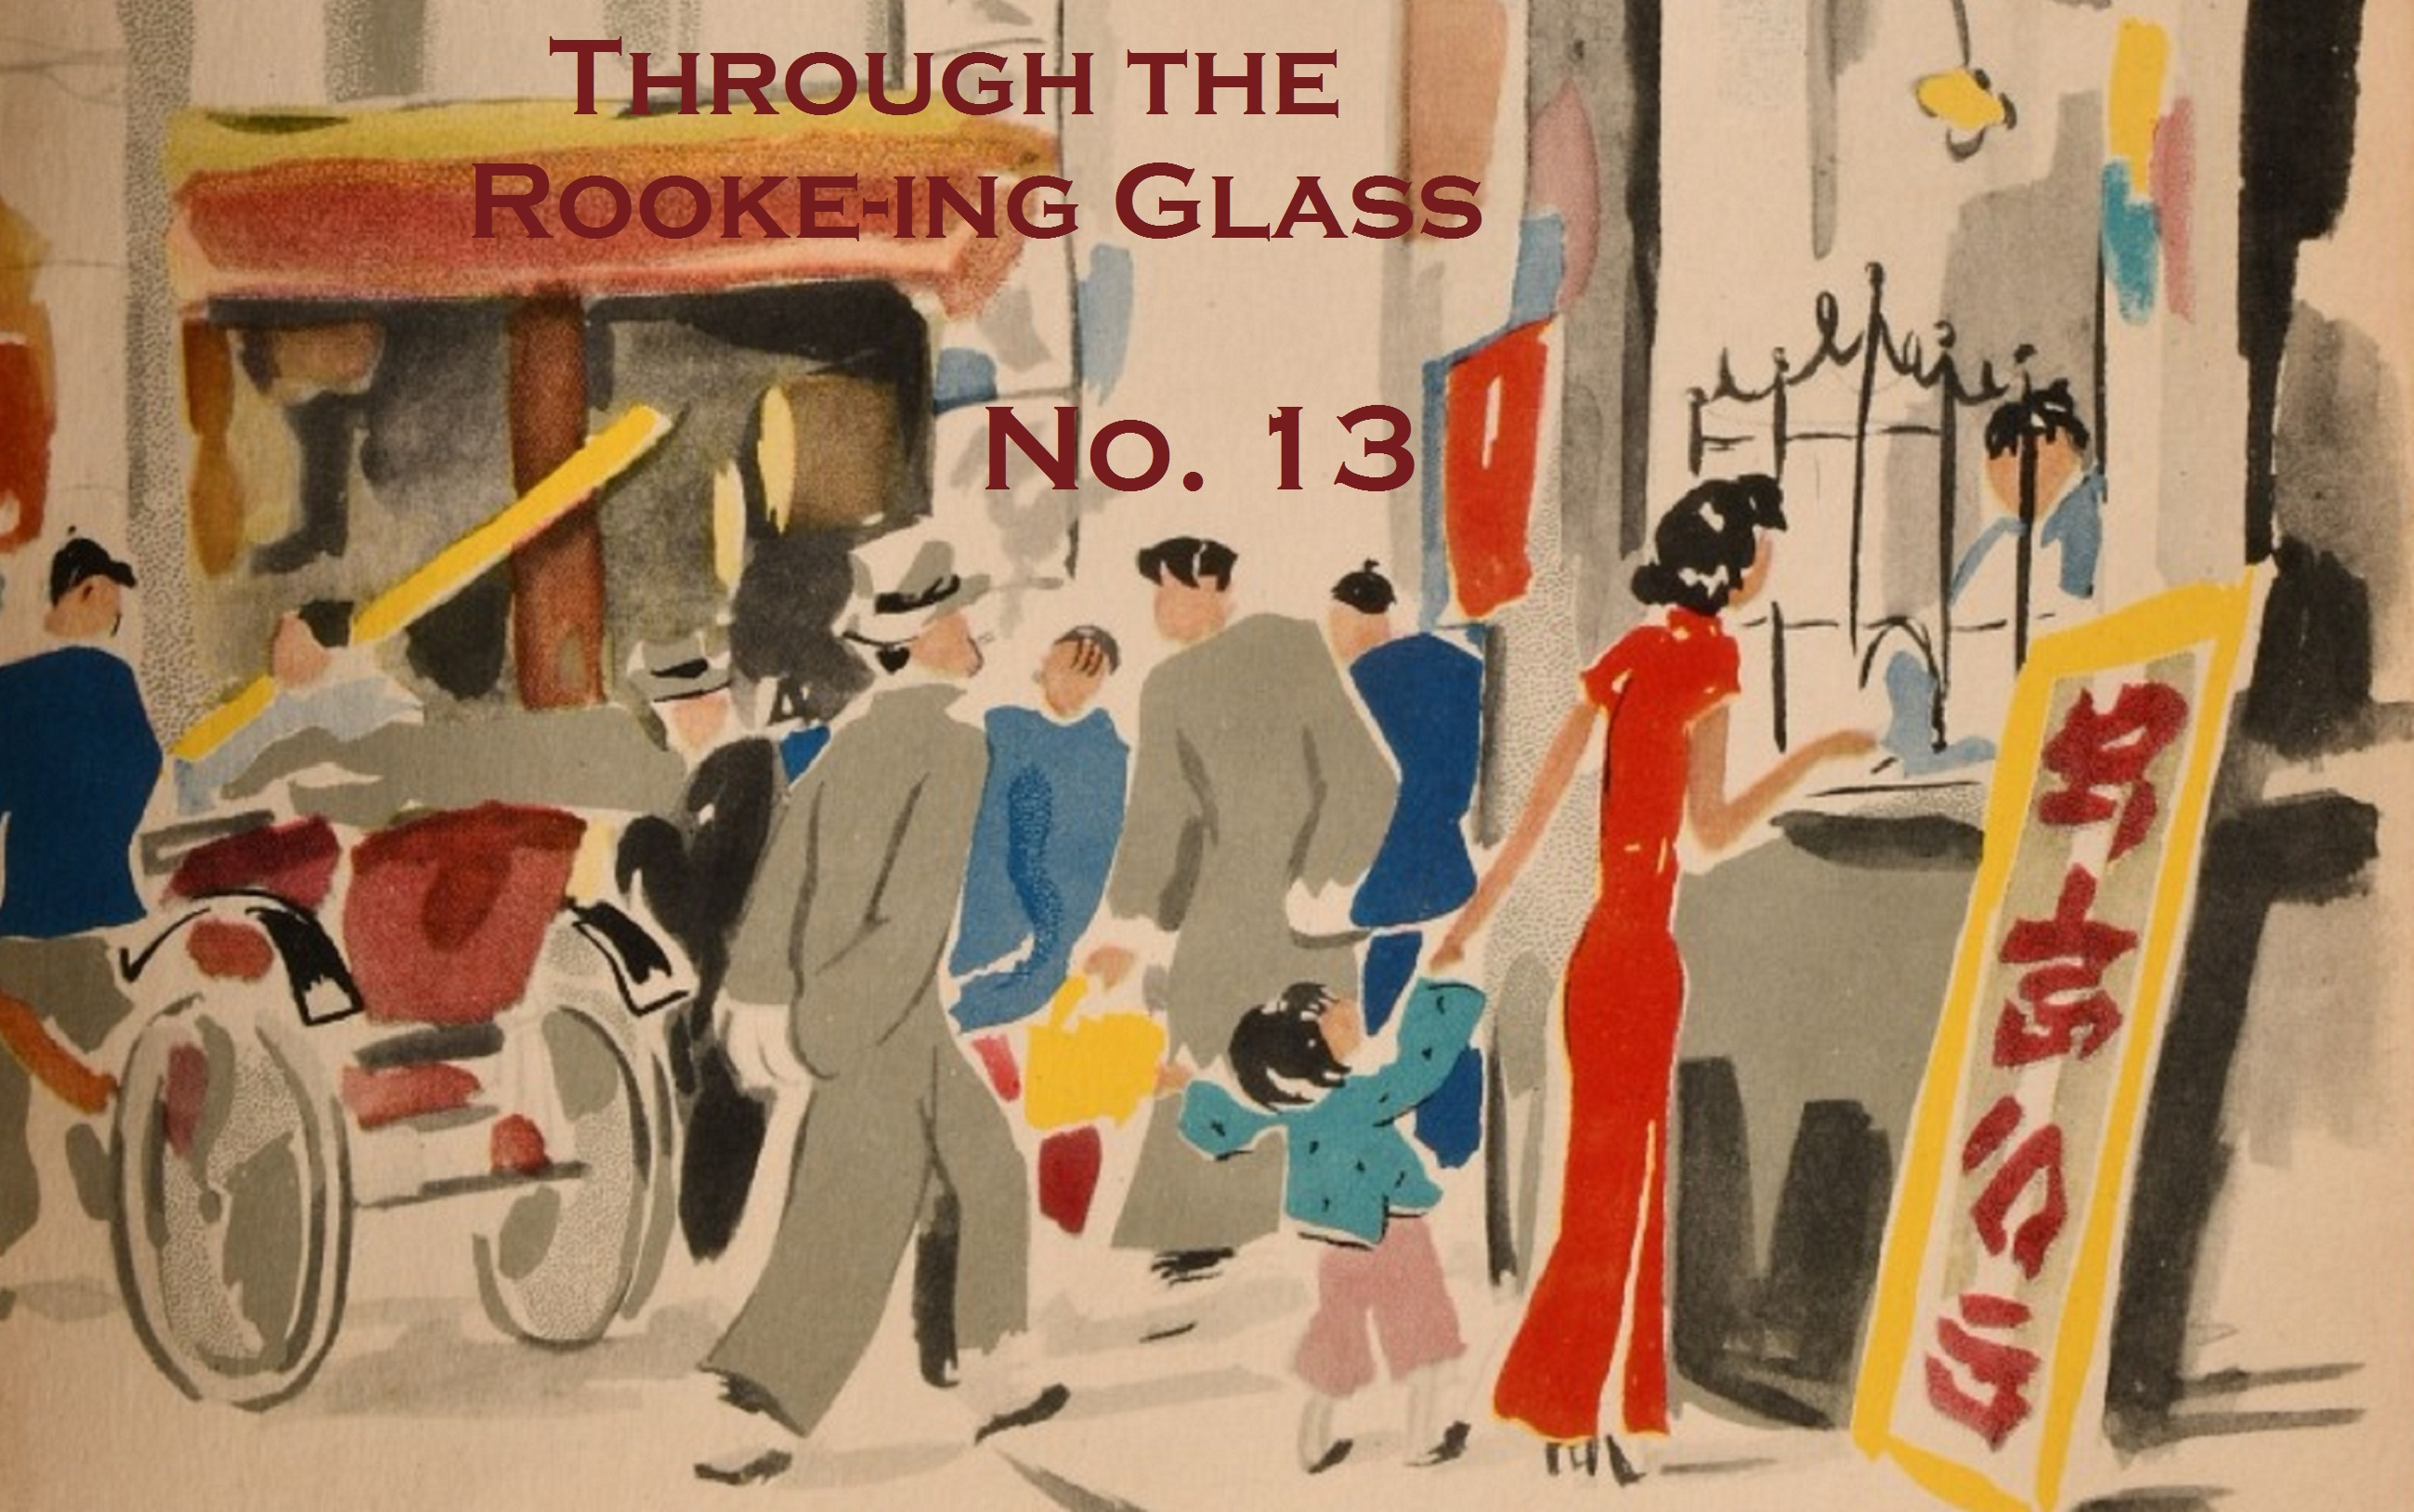 Through the Rooke-ing Glass No. 13